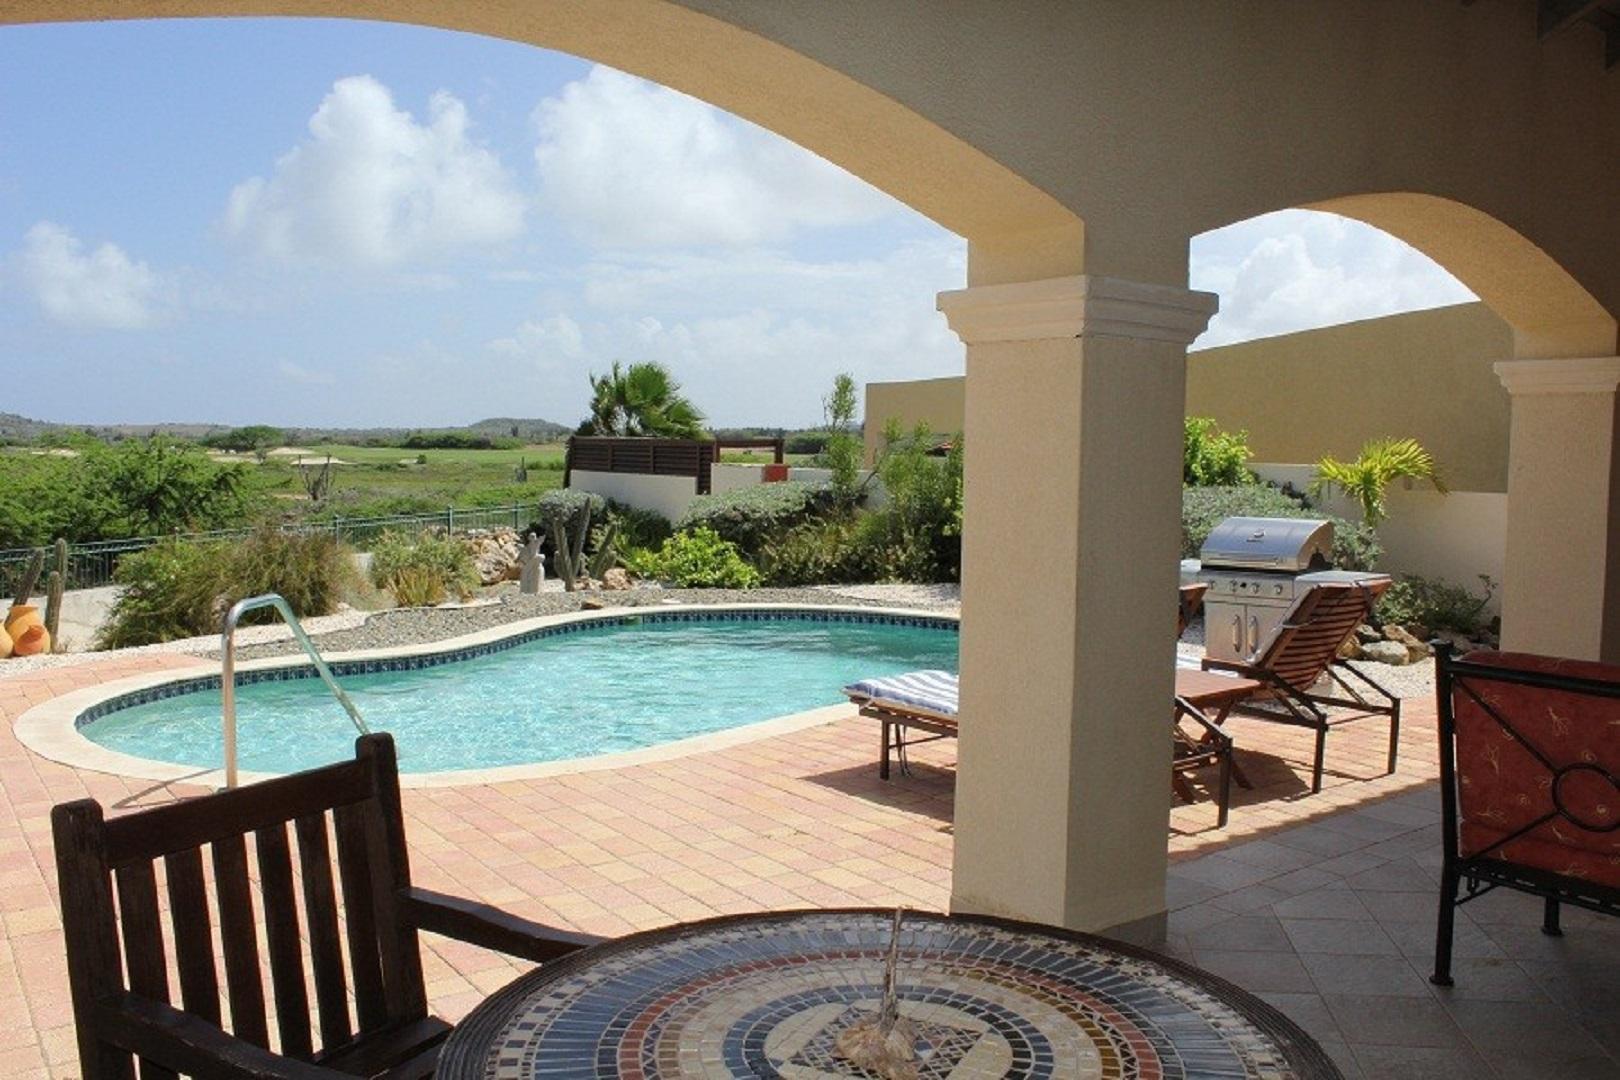 A Villa Paradiso, located on Tierra del Sol photo 27925766